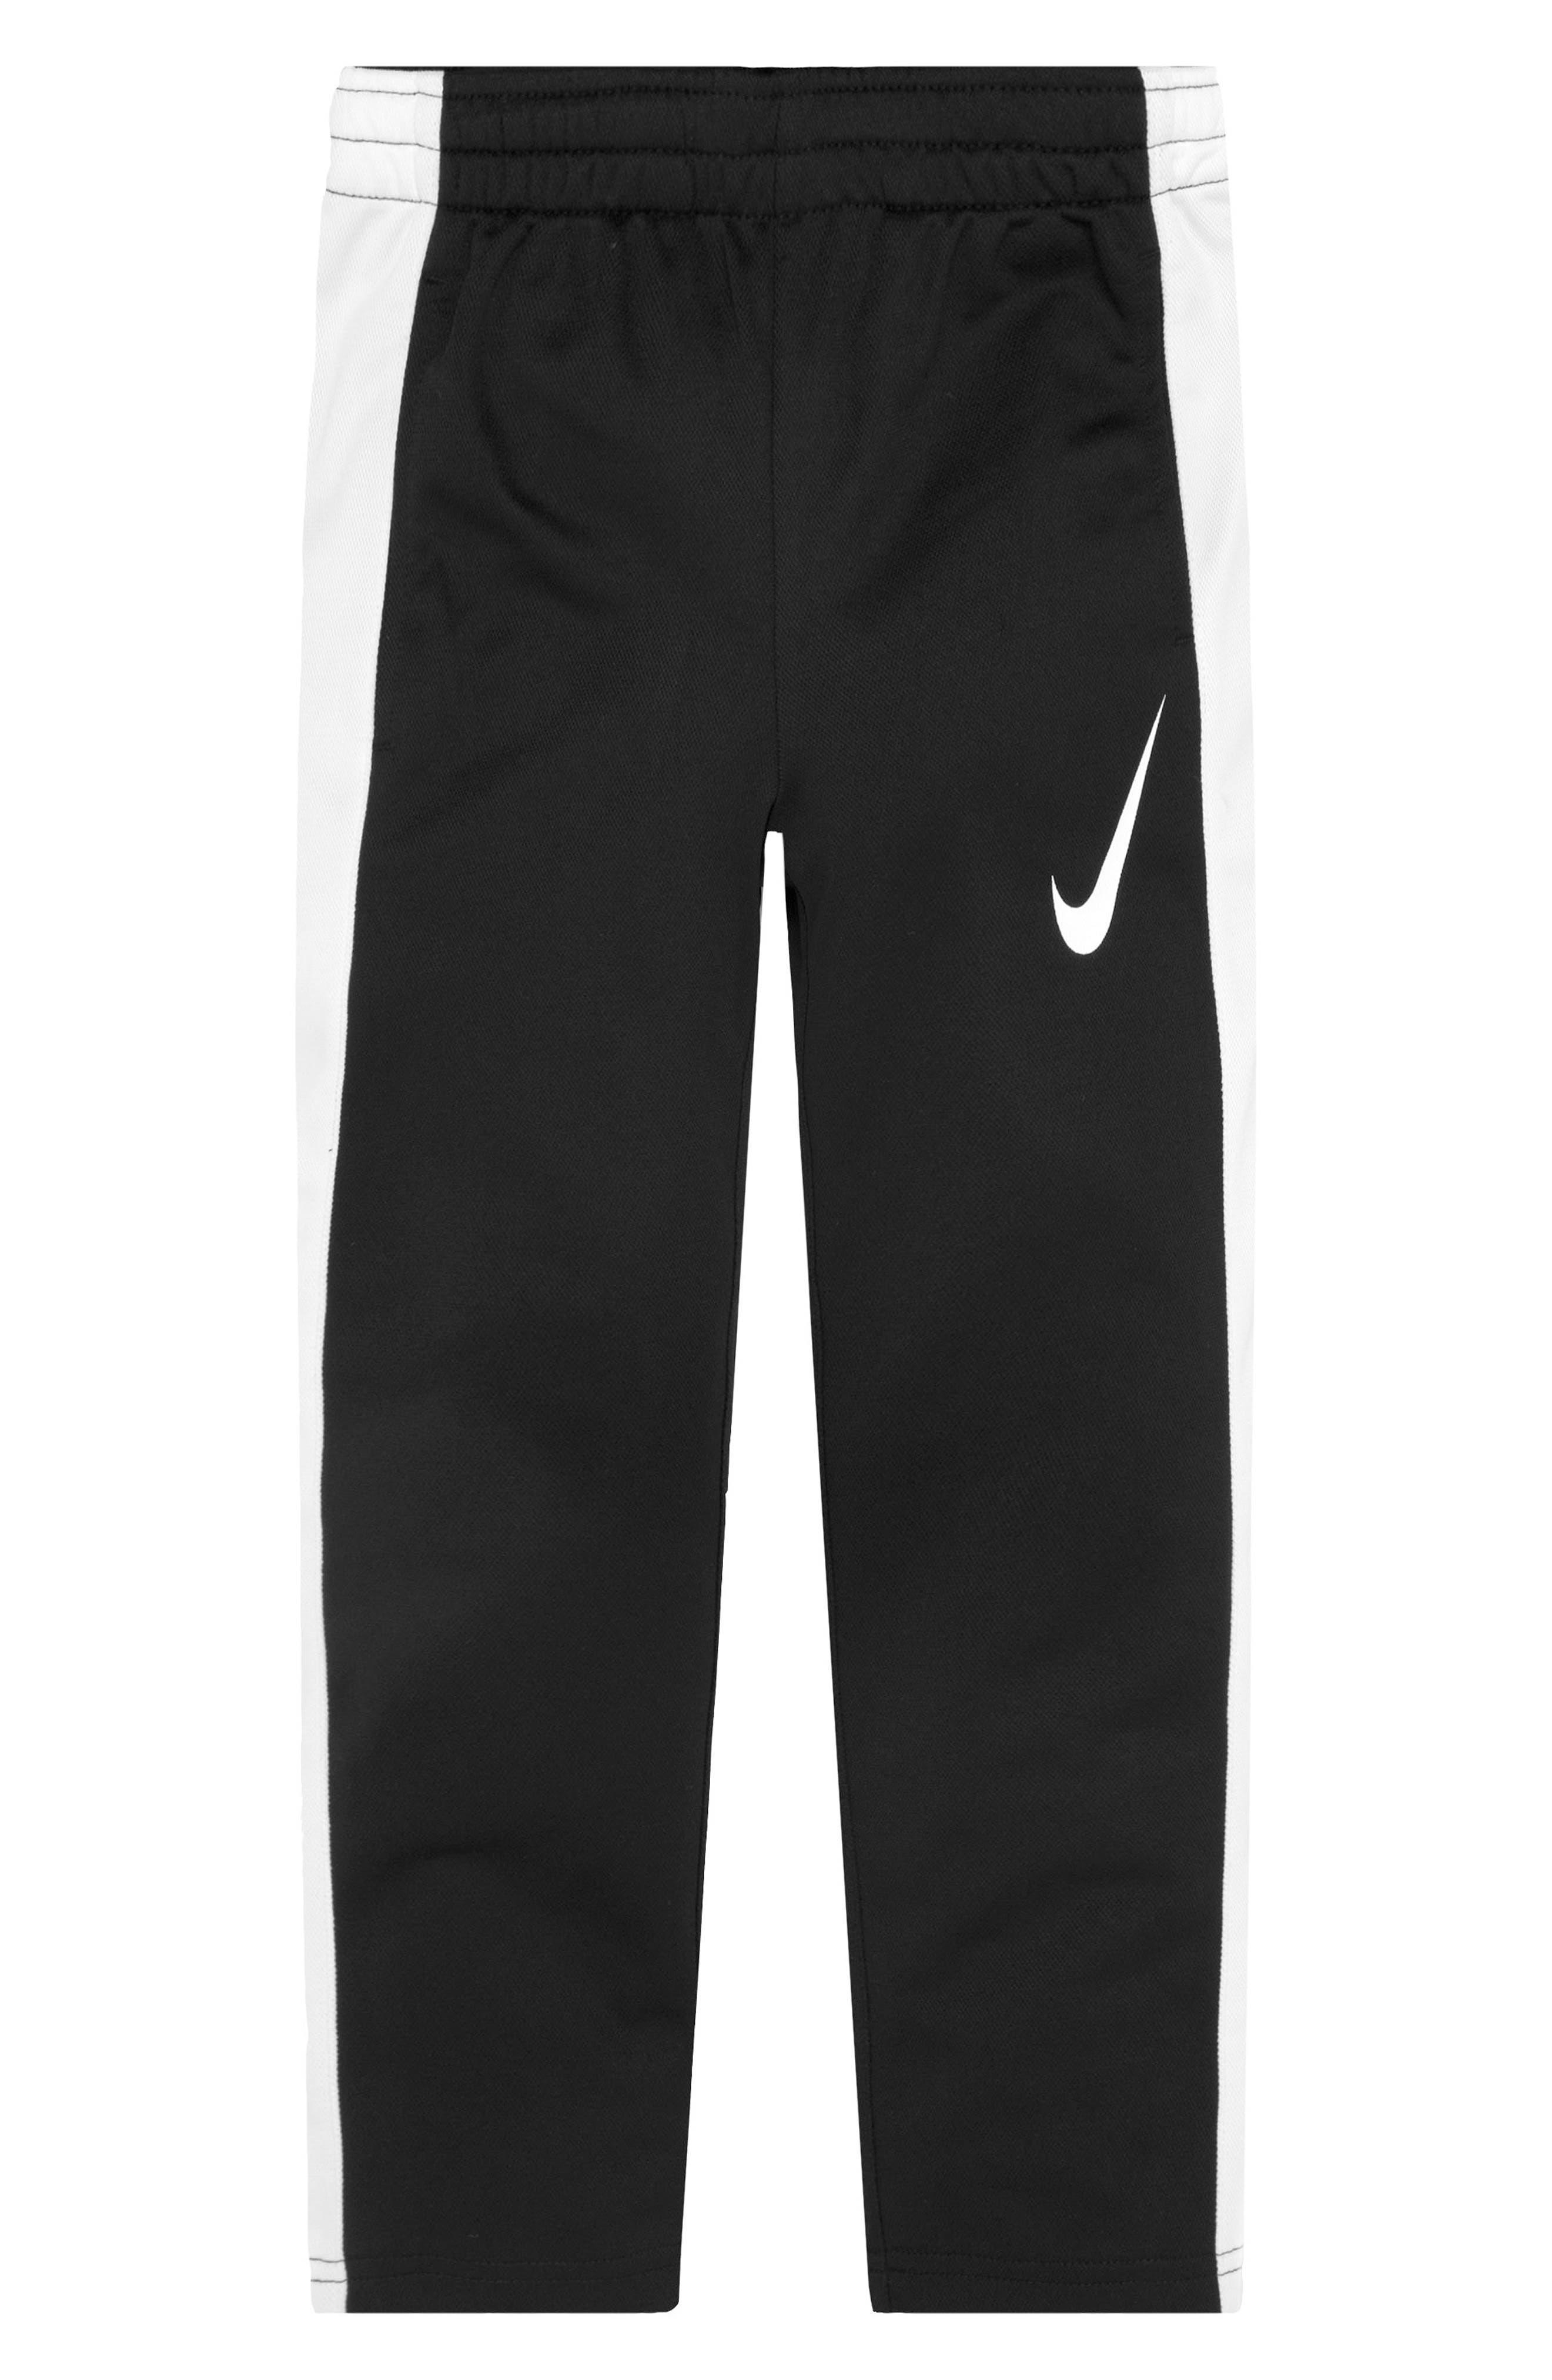 Nike Performance Knit Track Pants (Toddler Boys & Little Boys)